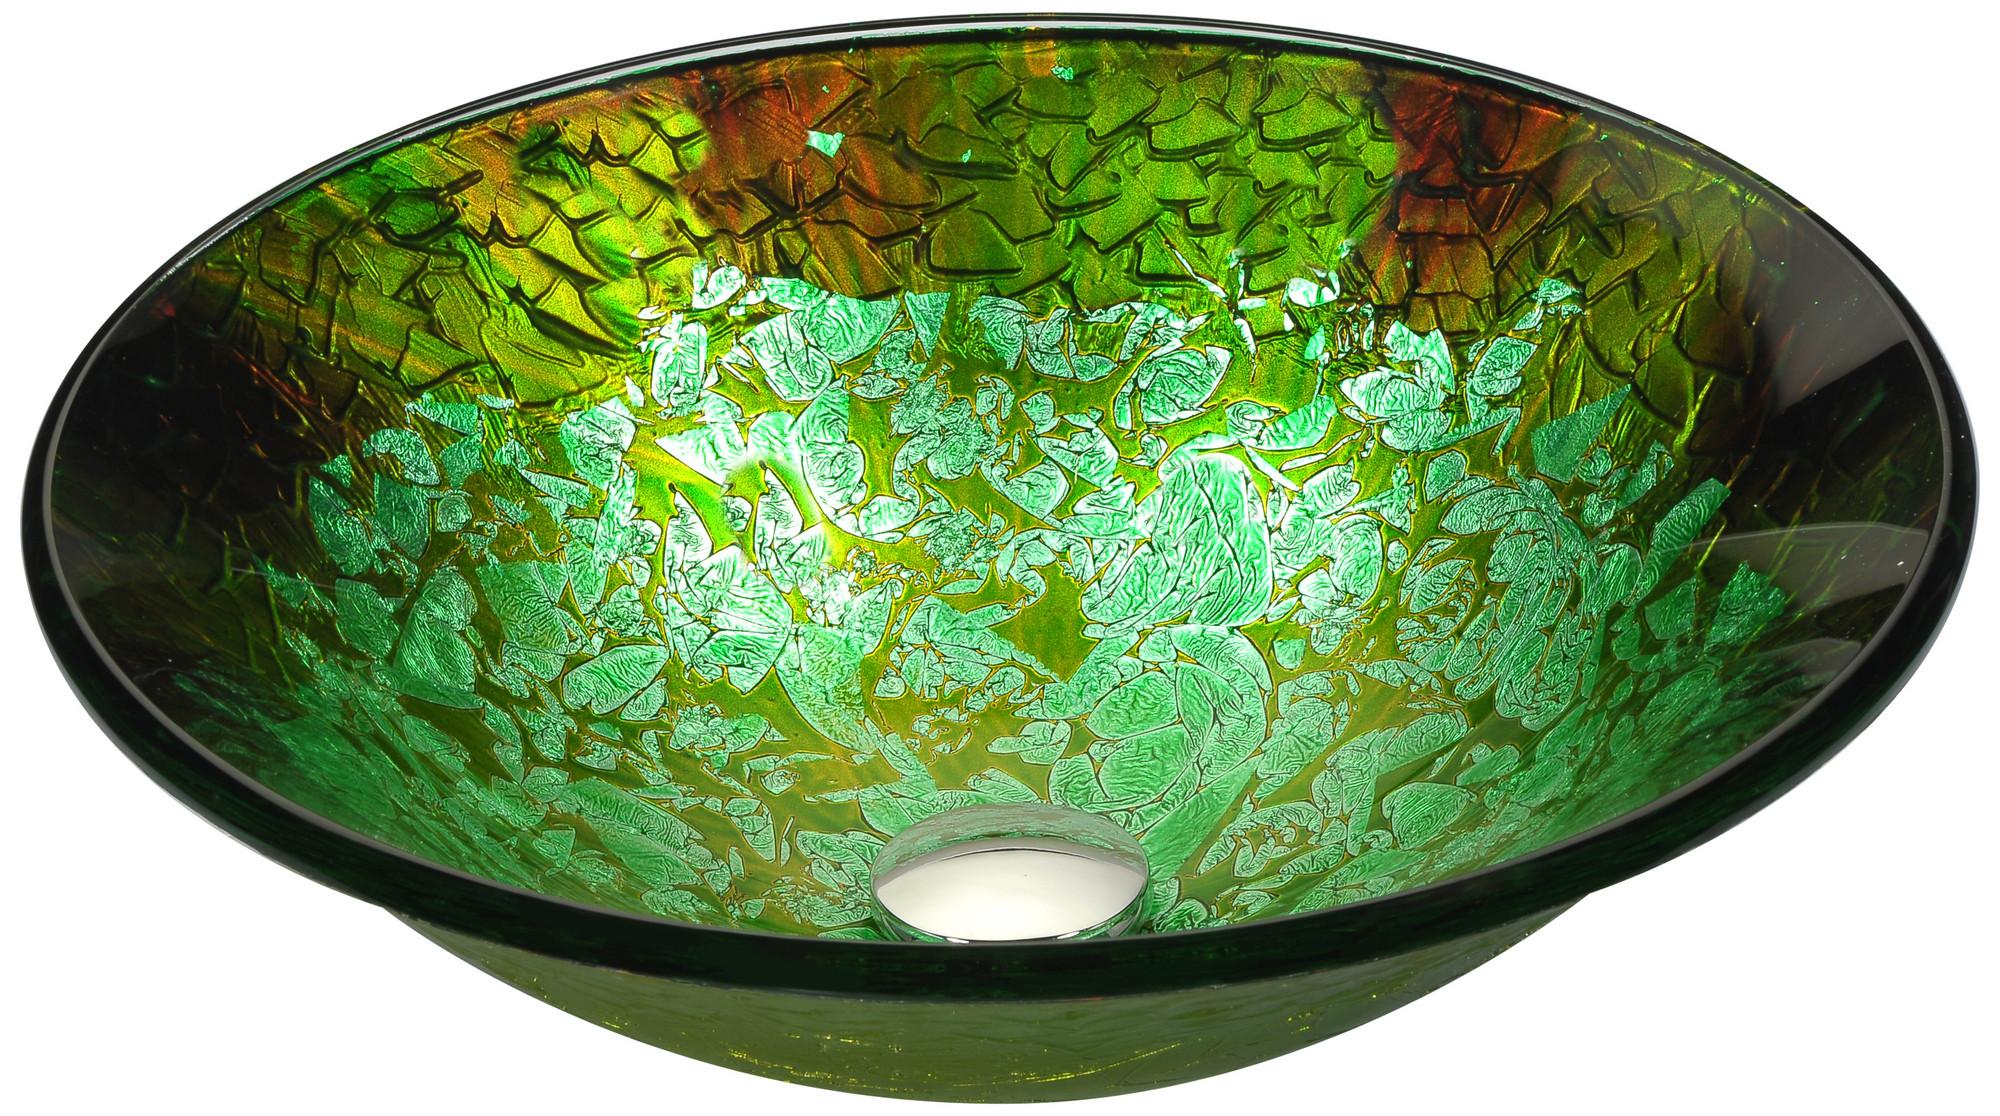 ANZZI LS-AZ213 Chrona Series Deco-Glass Vessel Sink In Emerald Burst